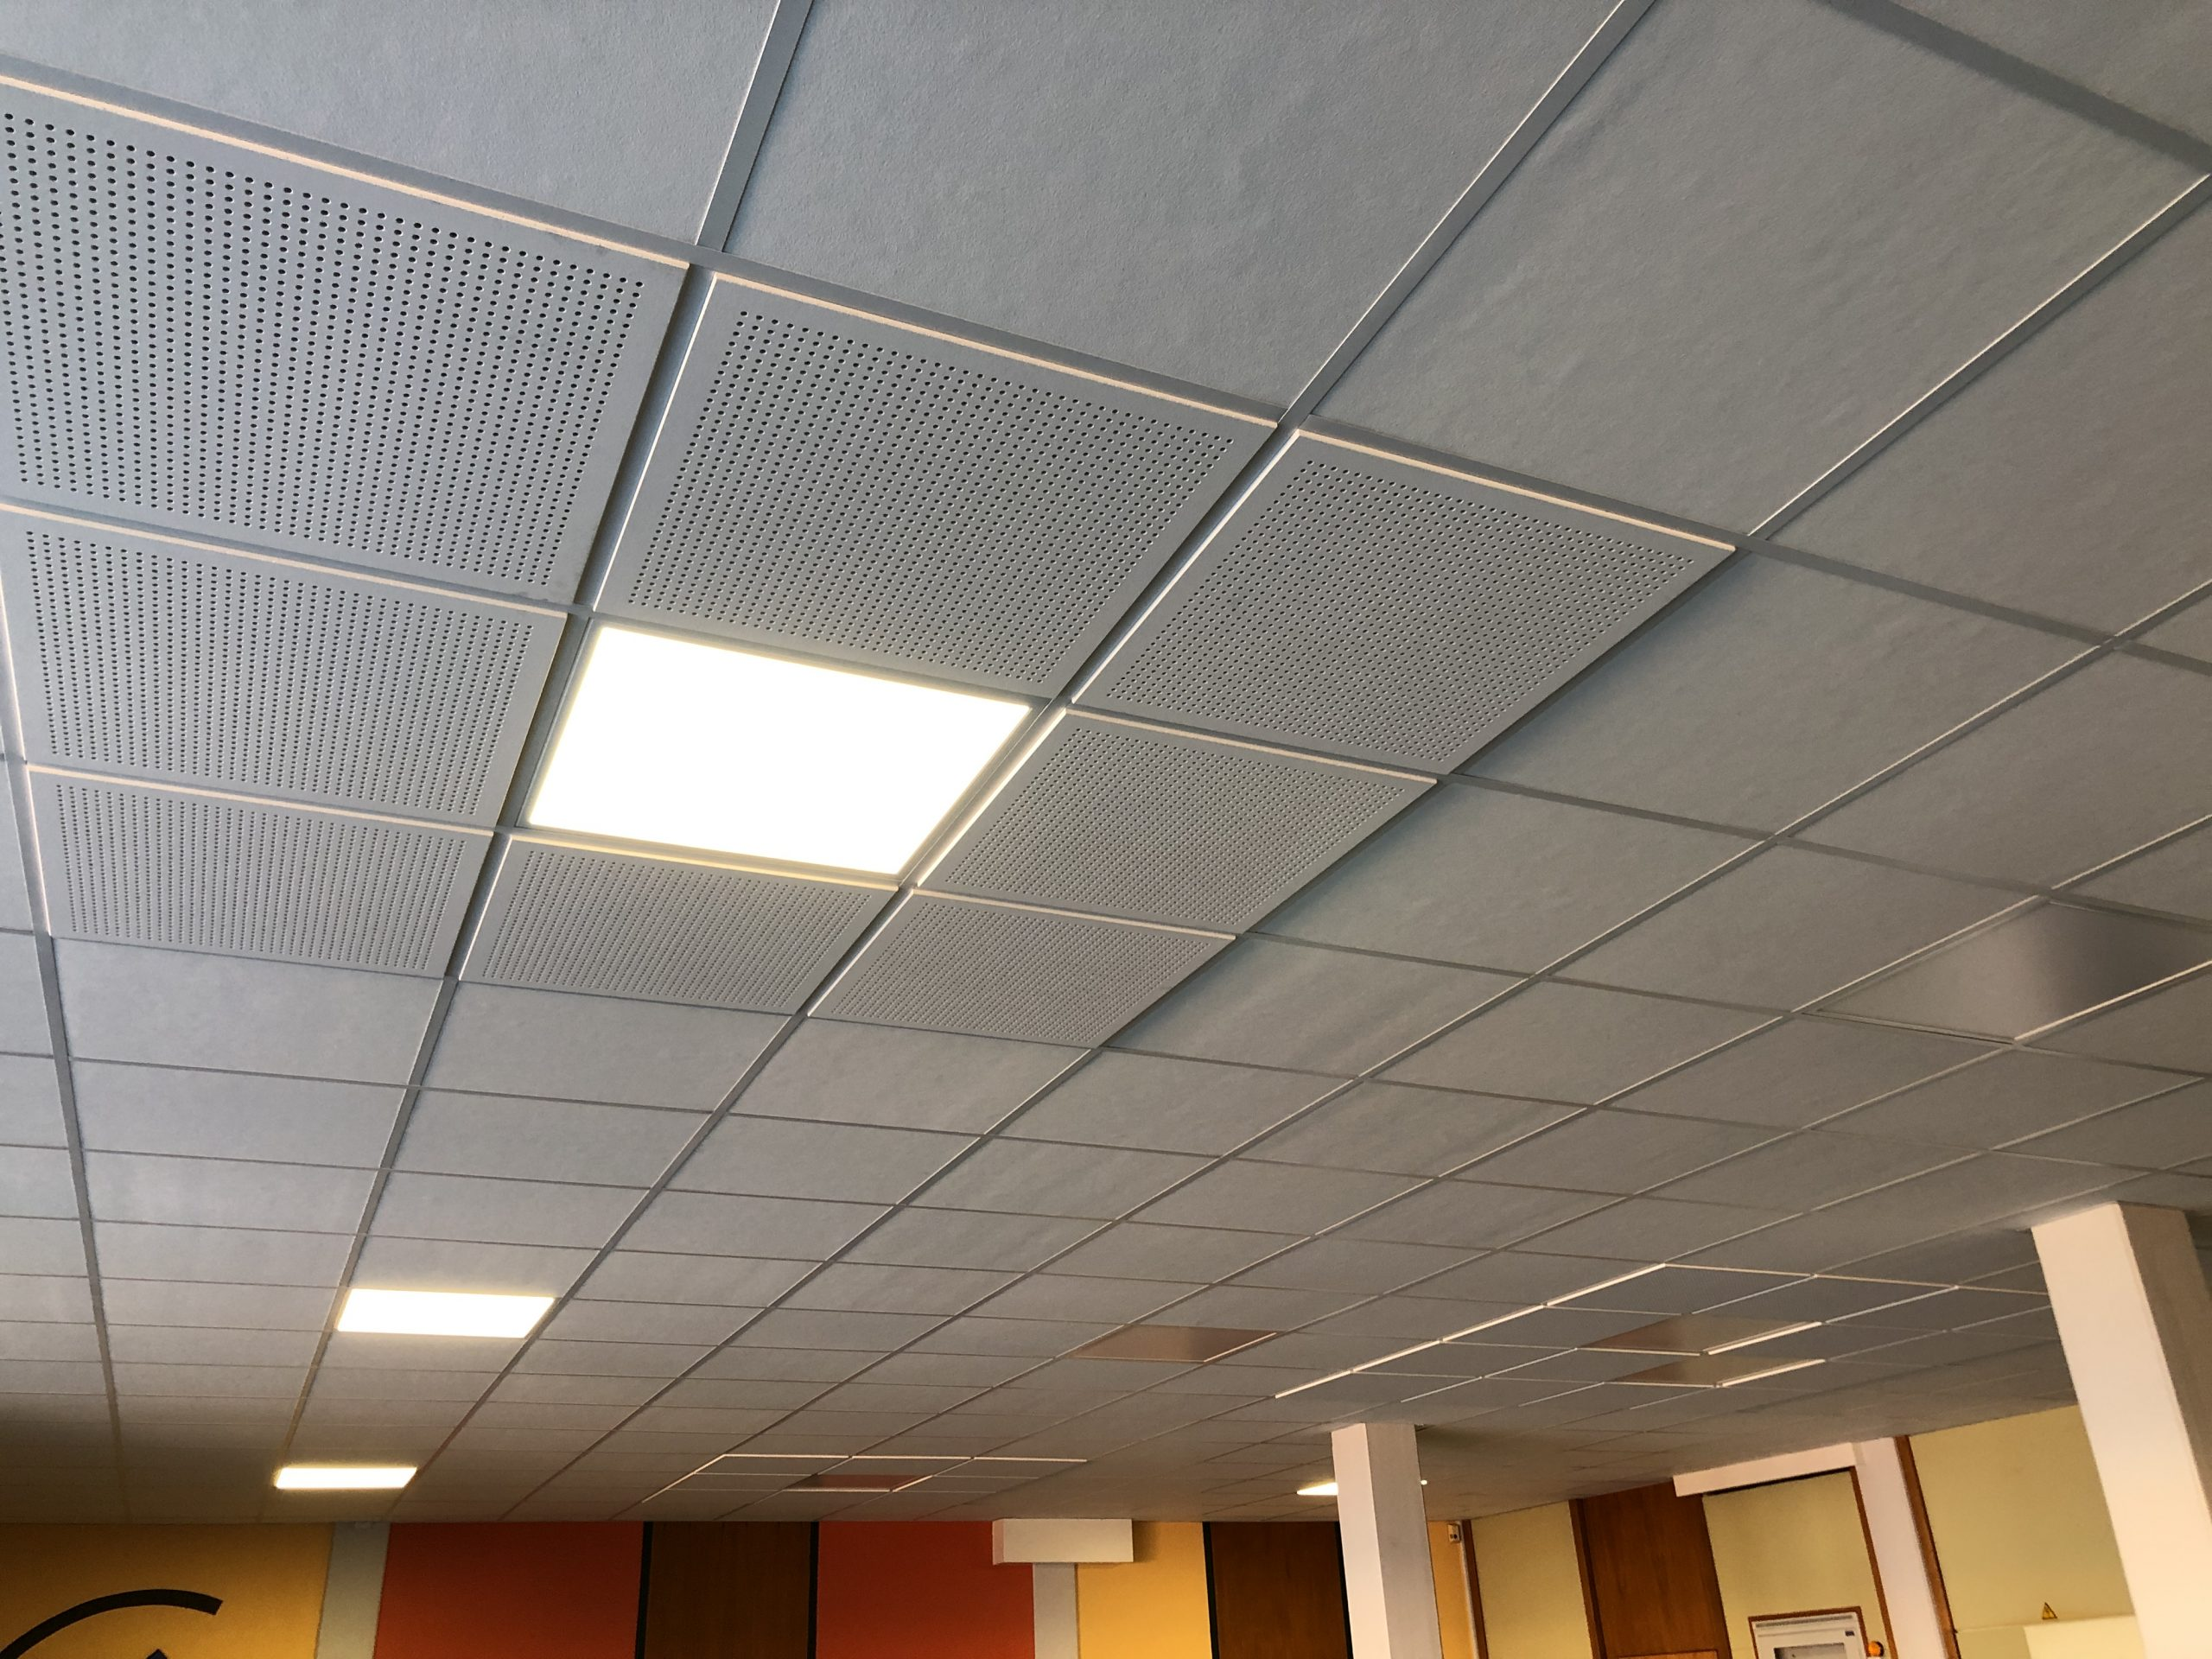 Akustikdecke Decken LED